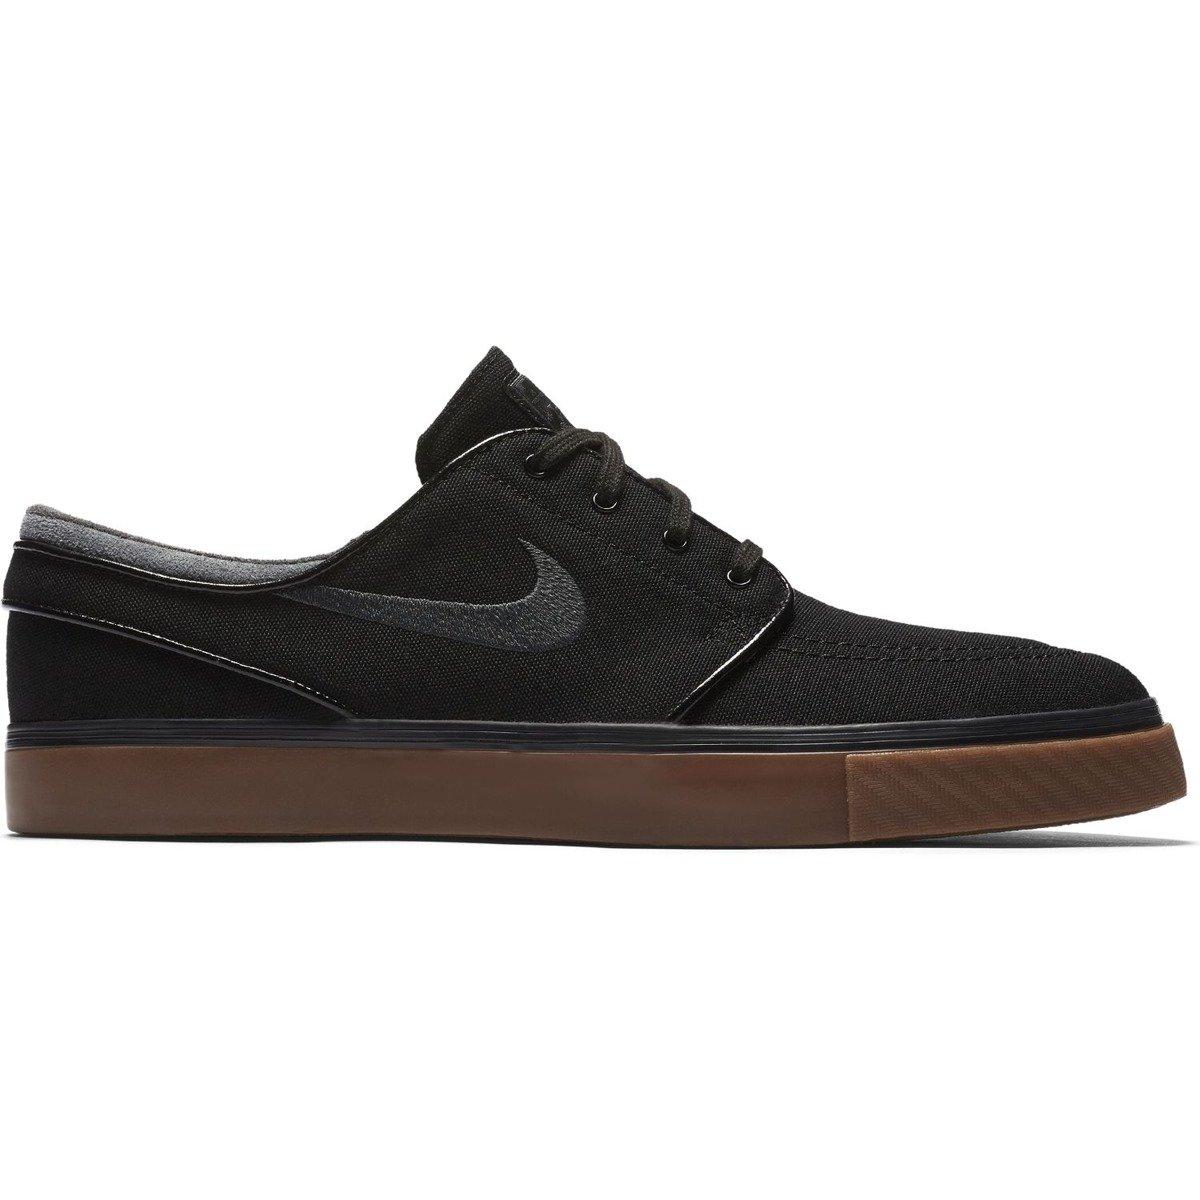 Buty Nike Zoom Sb Stefan Janoski Cnv - Noir / Anthracite Nike vue à vendre jJizzq